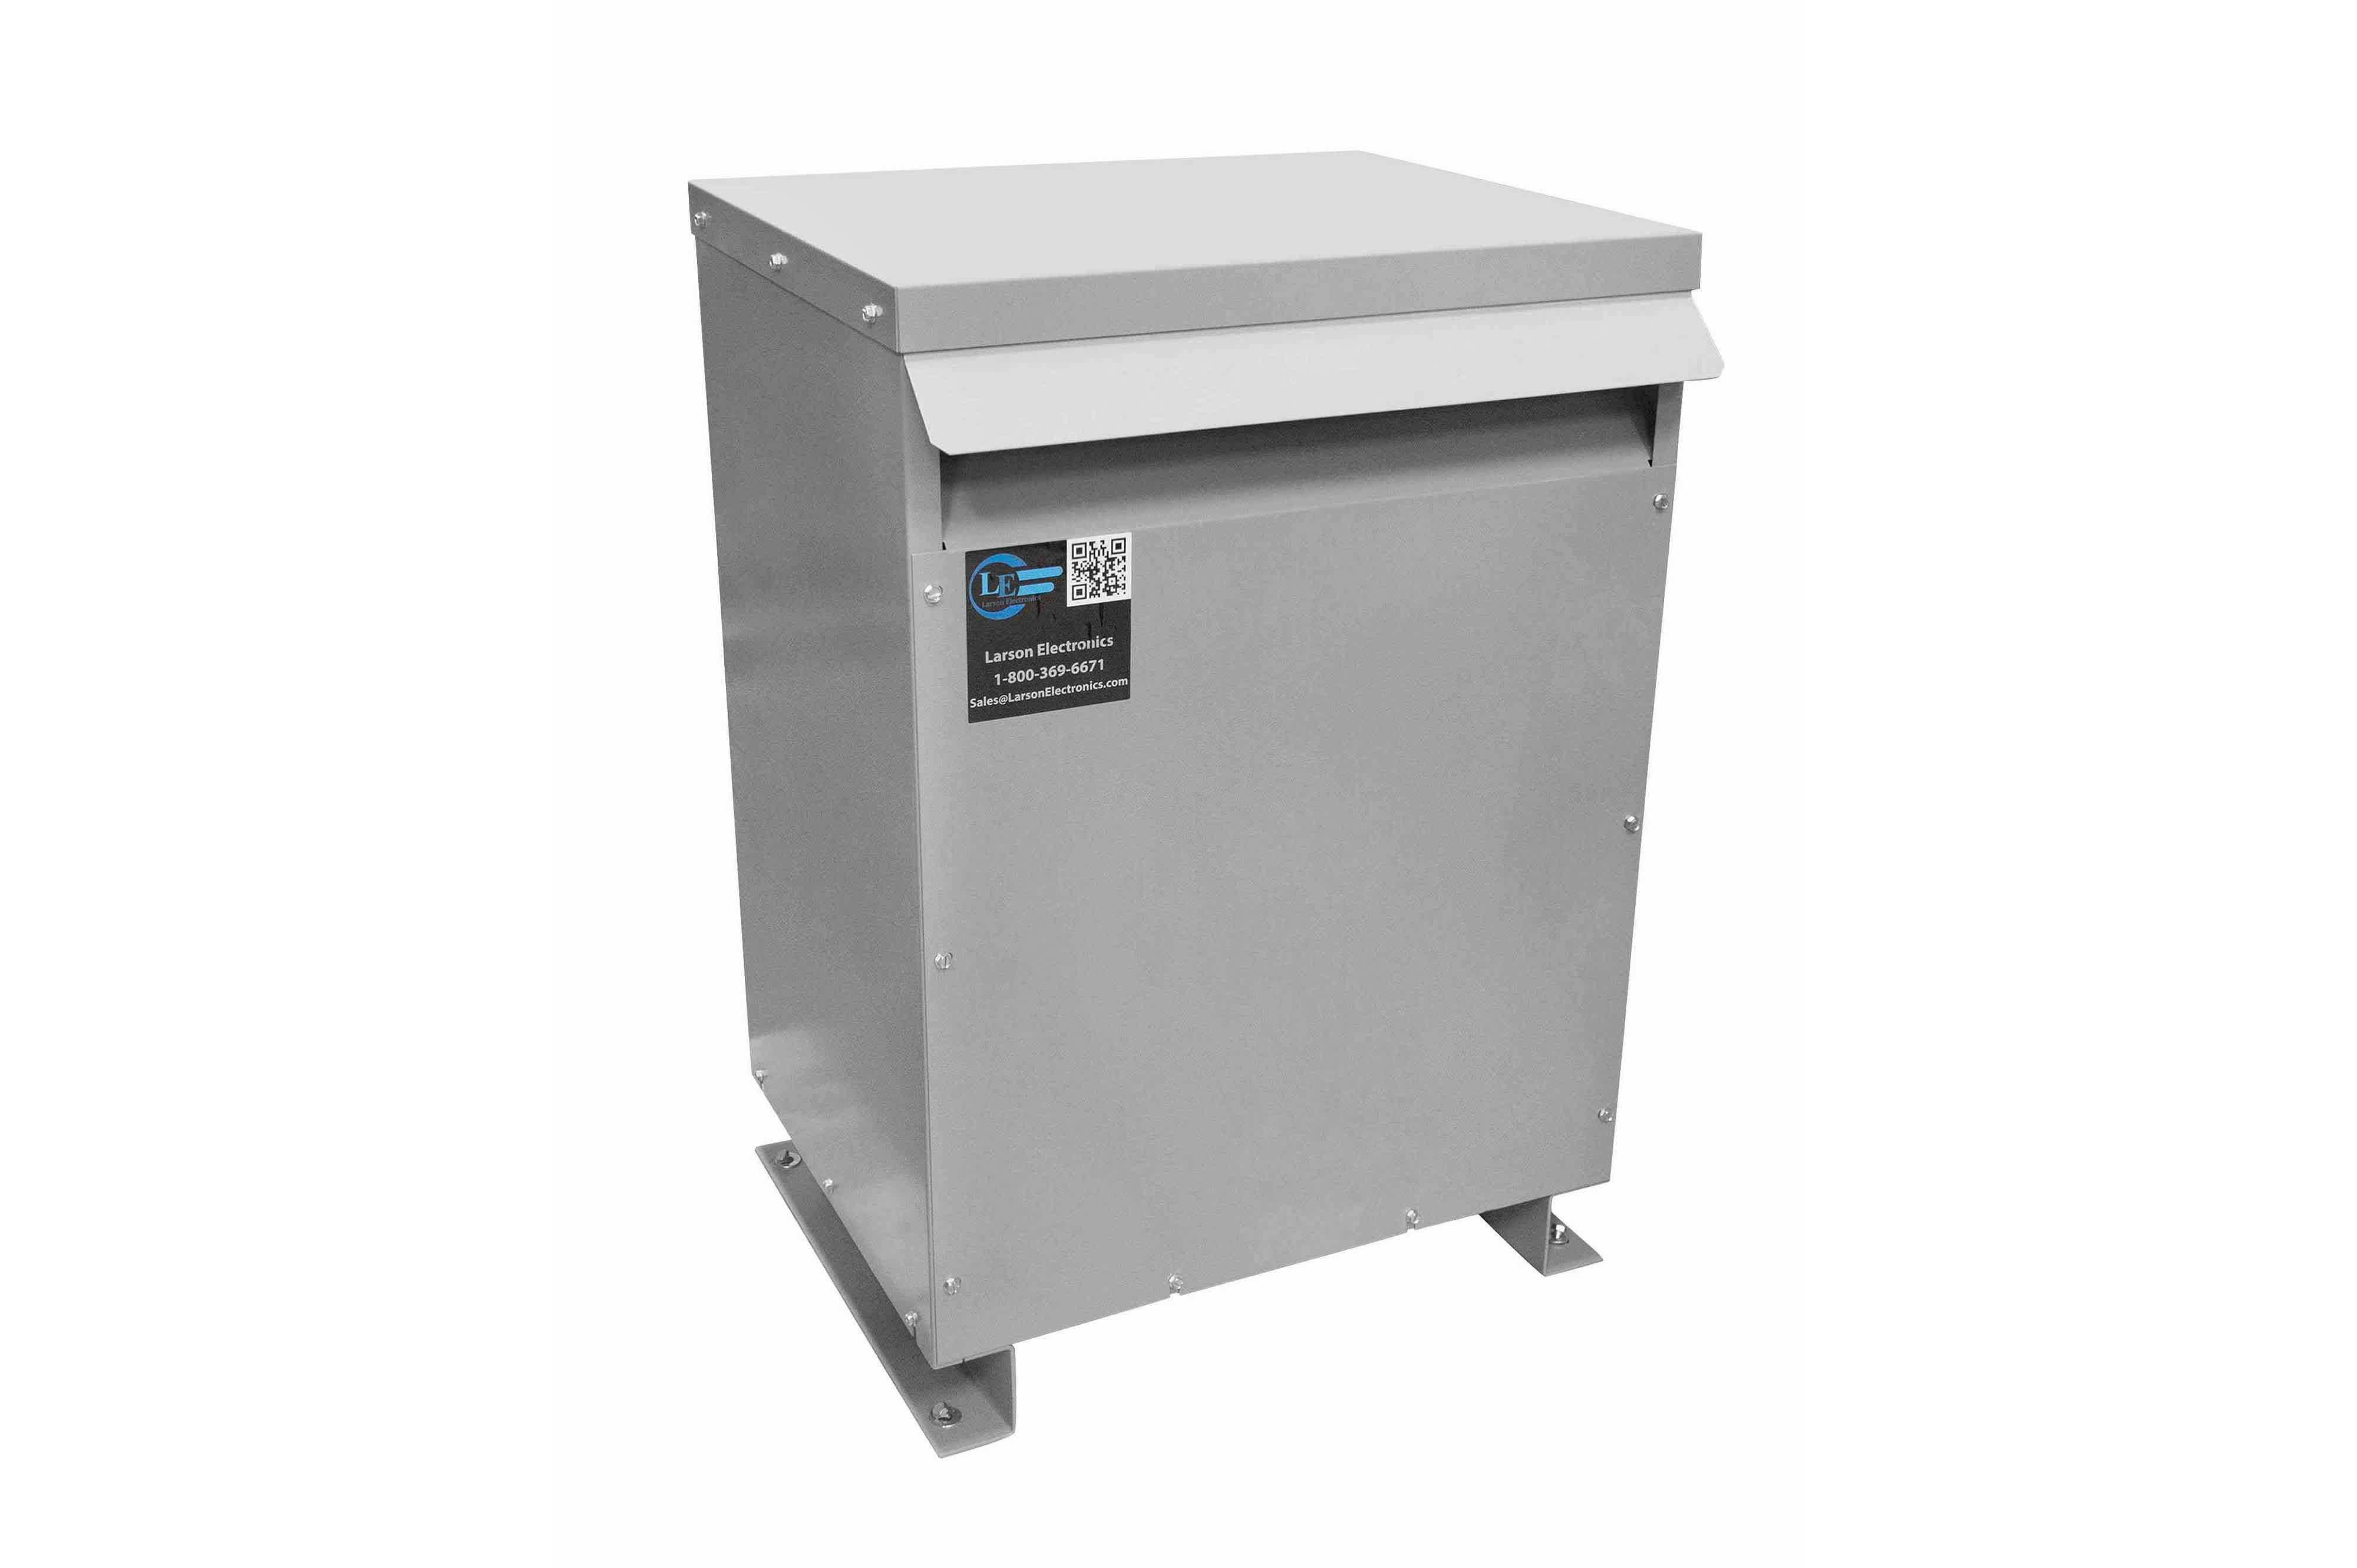 800 kVA 3PH DOE Transformer, 240V Delta Primary, 480Y/277 Wye-N Secondary, N3R, Ventilated, 60 Hz